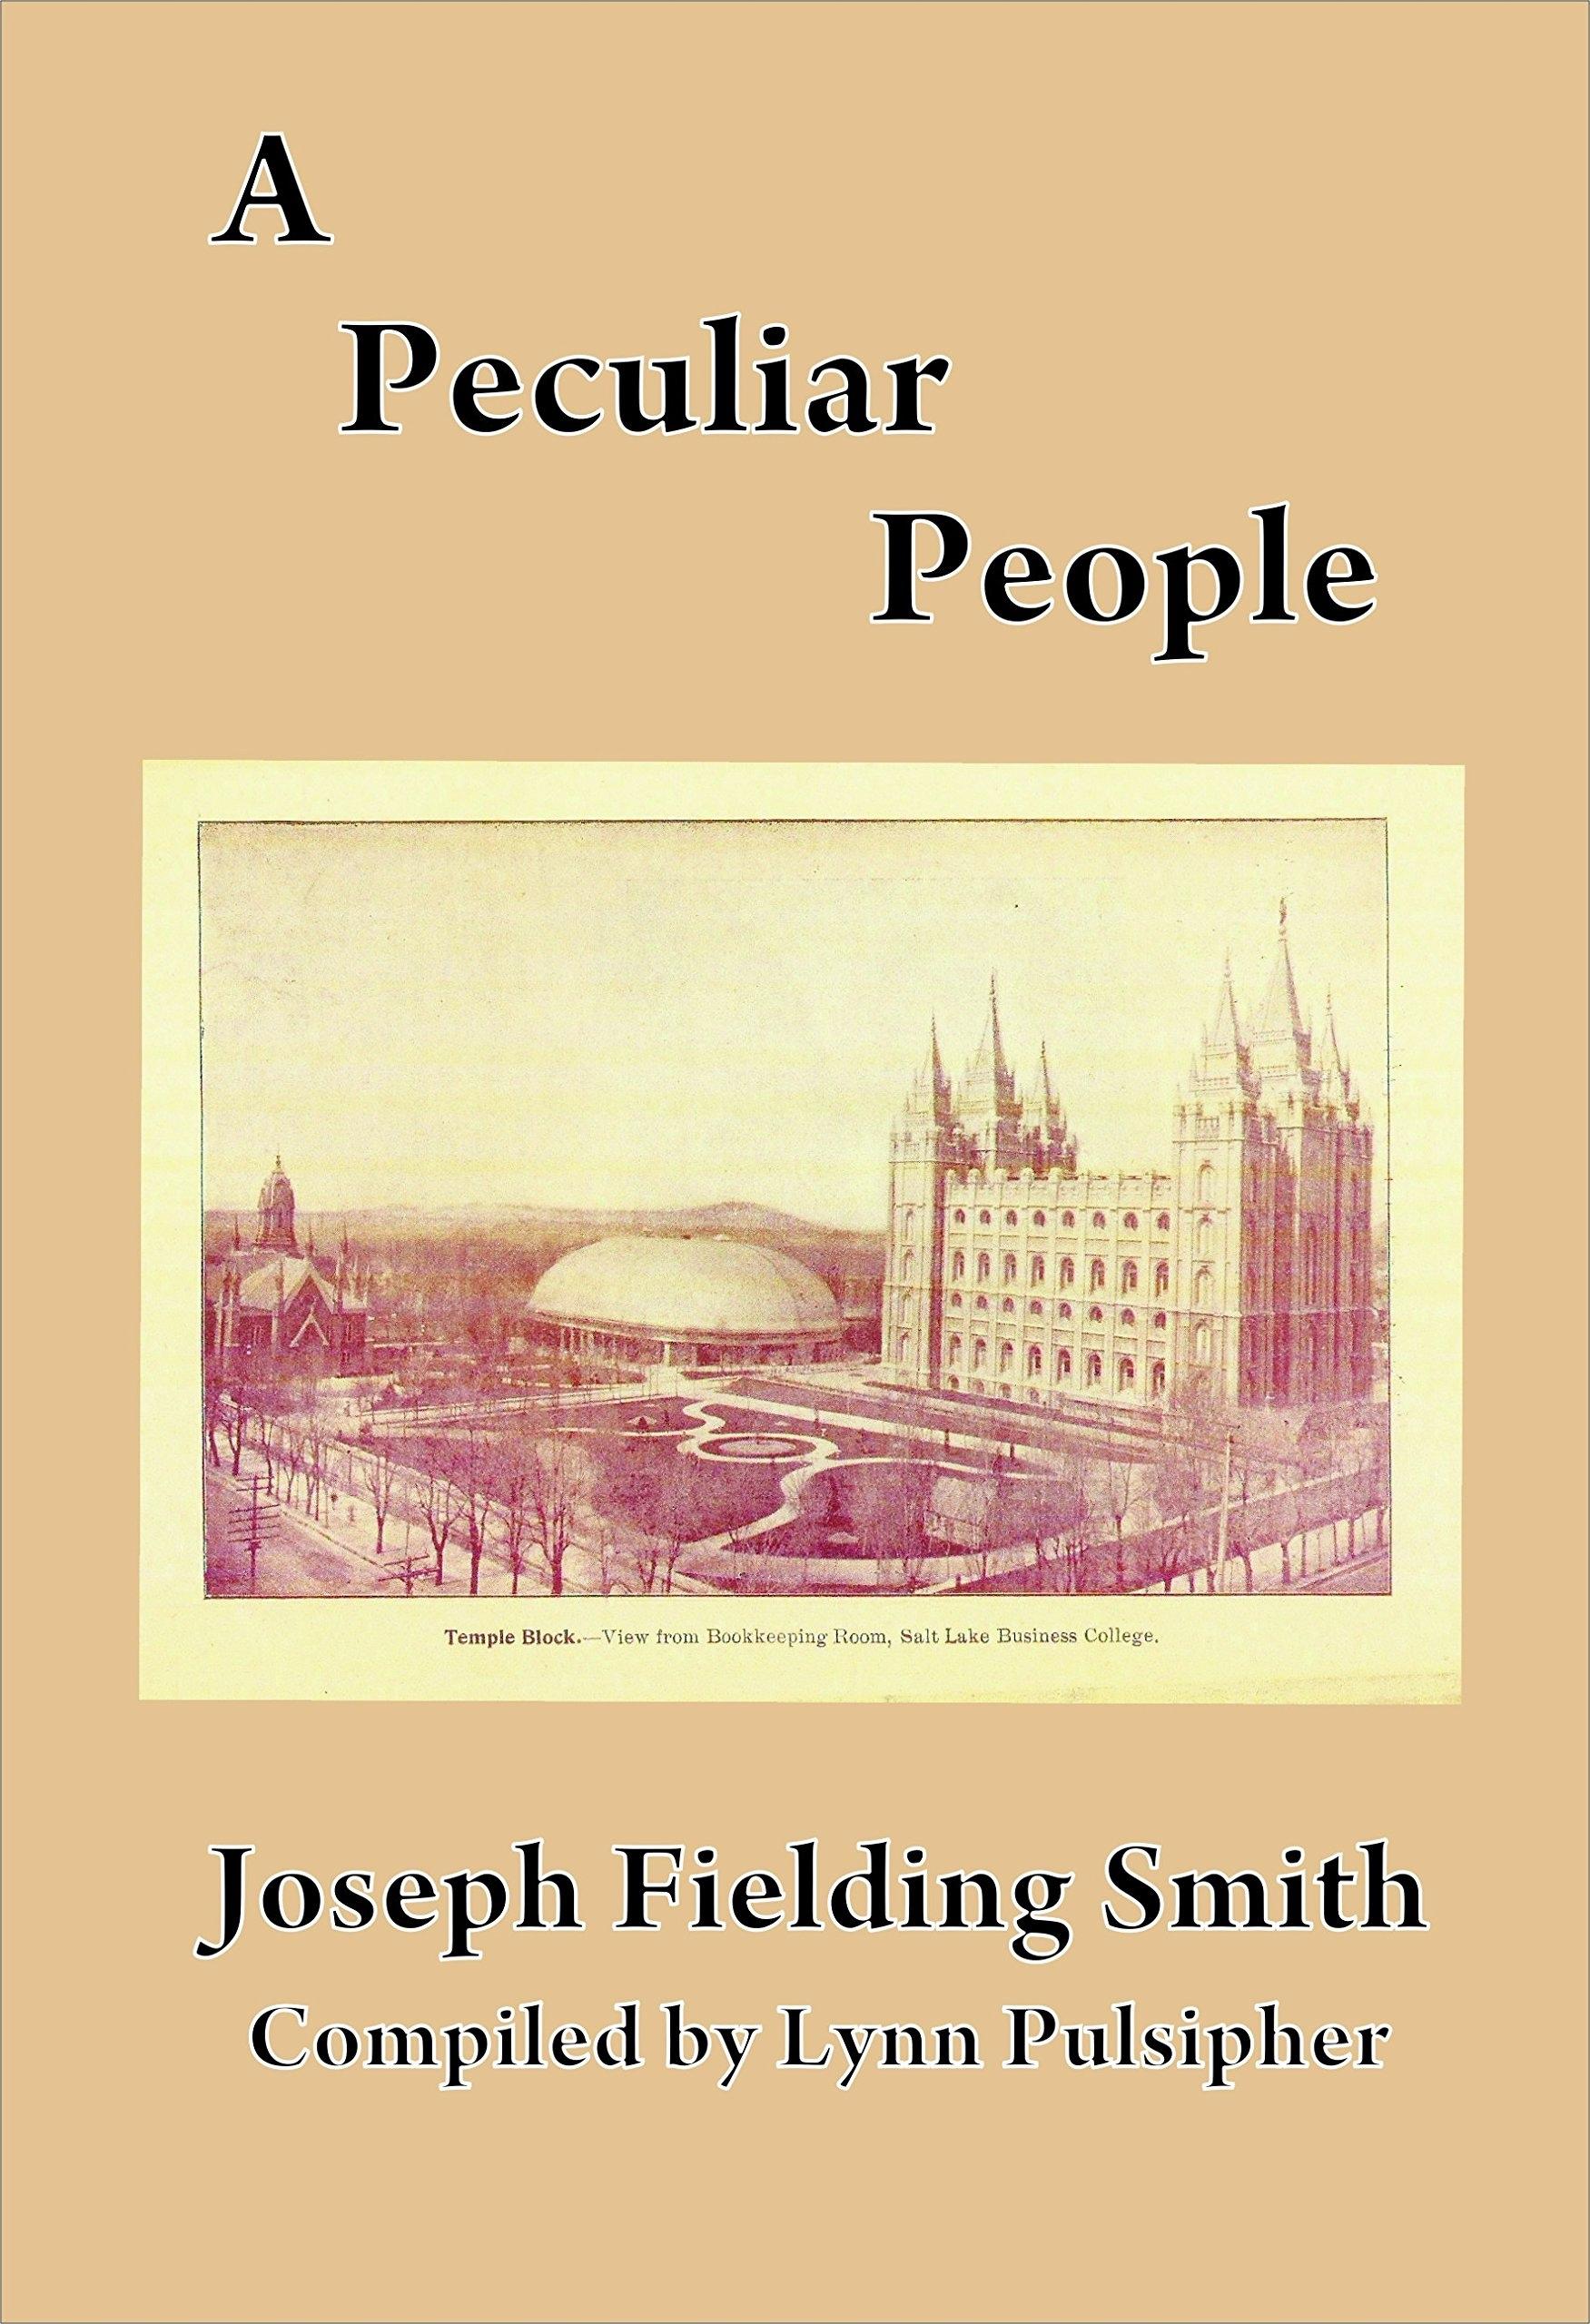 PECULIAR PEOPLE, Smith, Joseph Fielding (Author), Lynn Pulsipher (Editor)